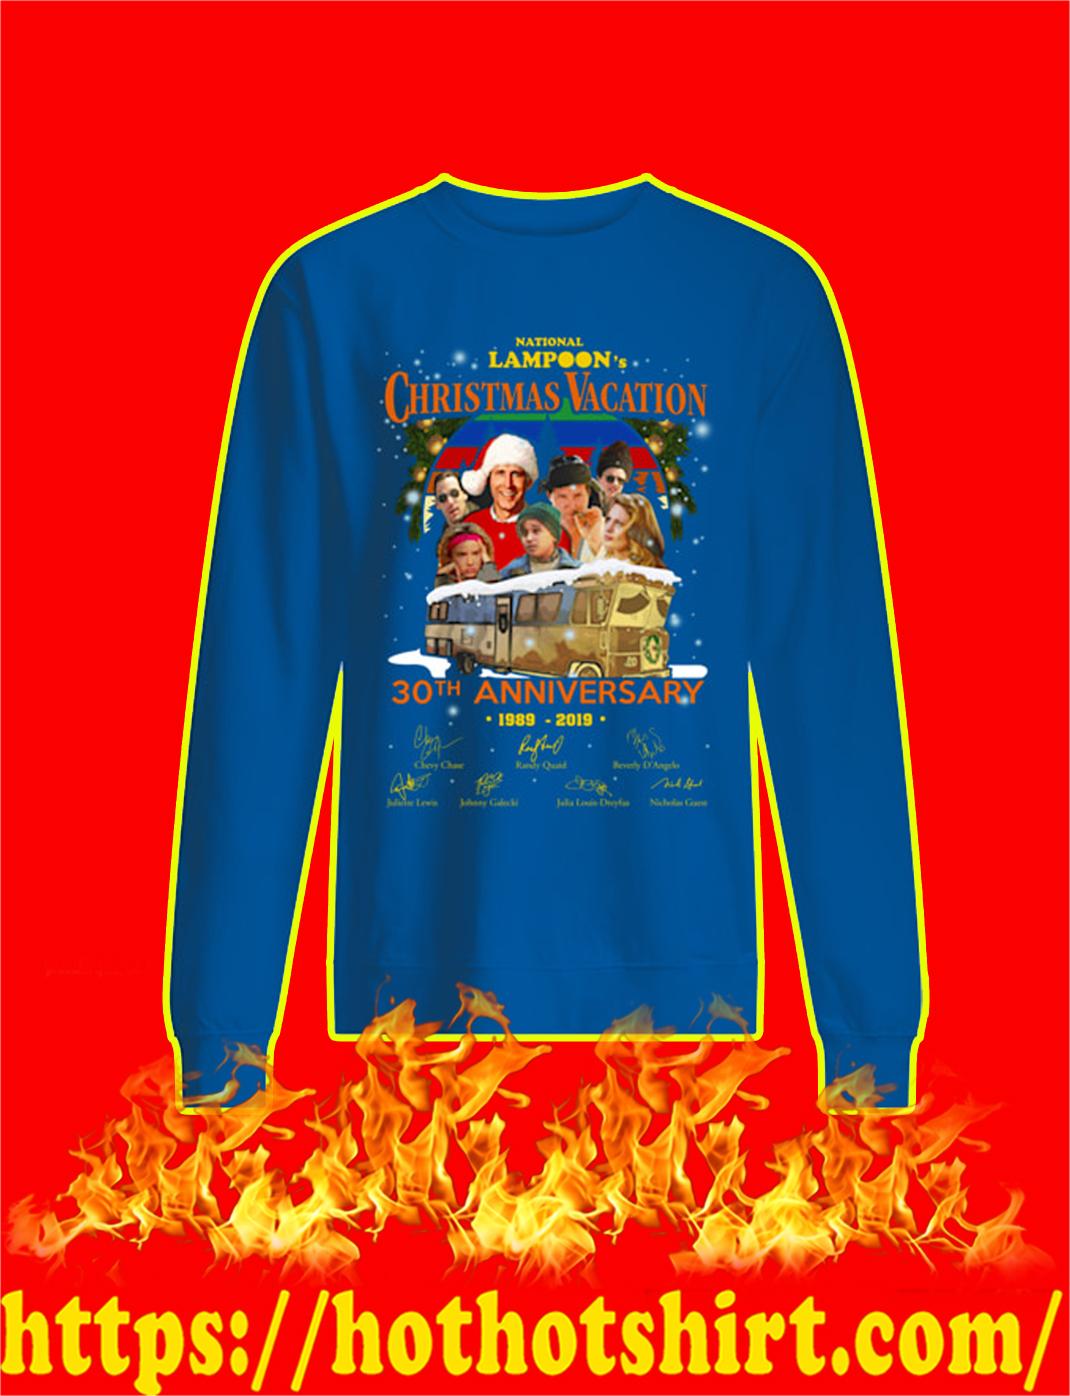 National Lampoon's Christmas Vacation 30th Anniversary 1989 2019 sweatshirt